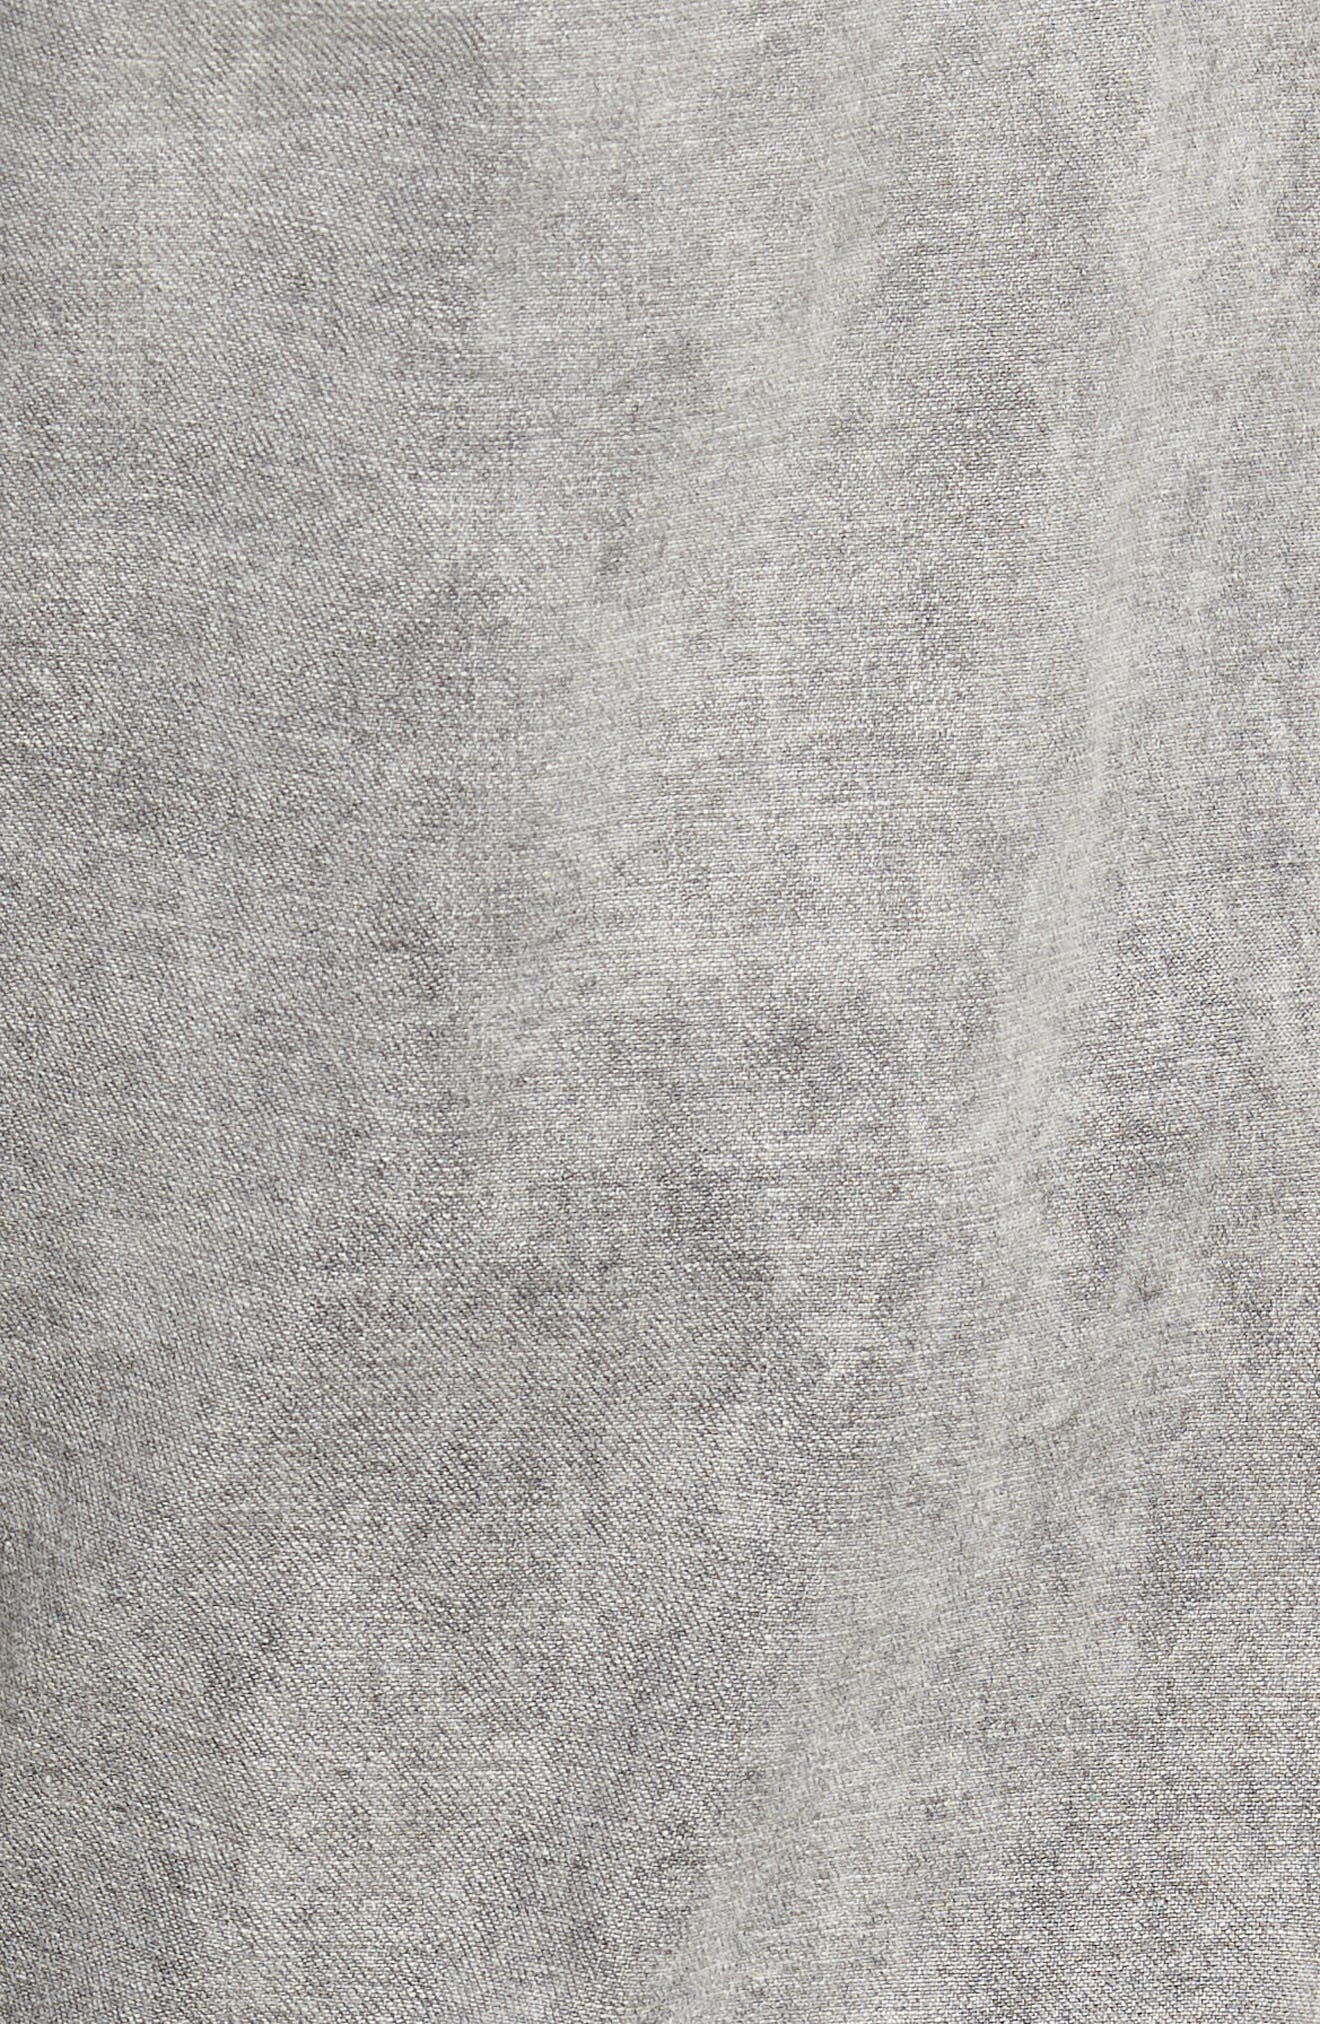 Blake Slim Fit Jeans,                             Alternate thumbnail 5, color,                             063